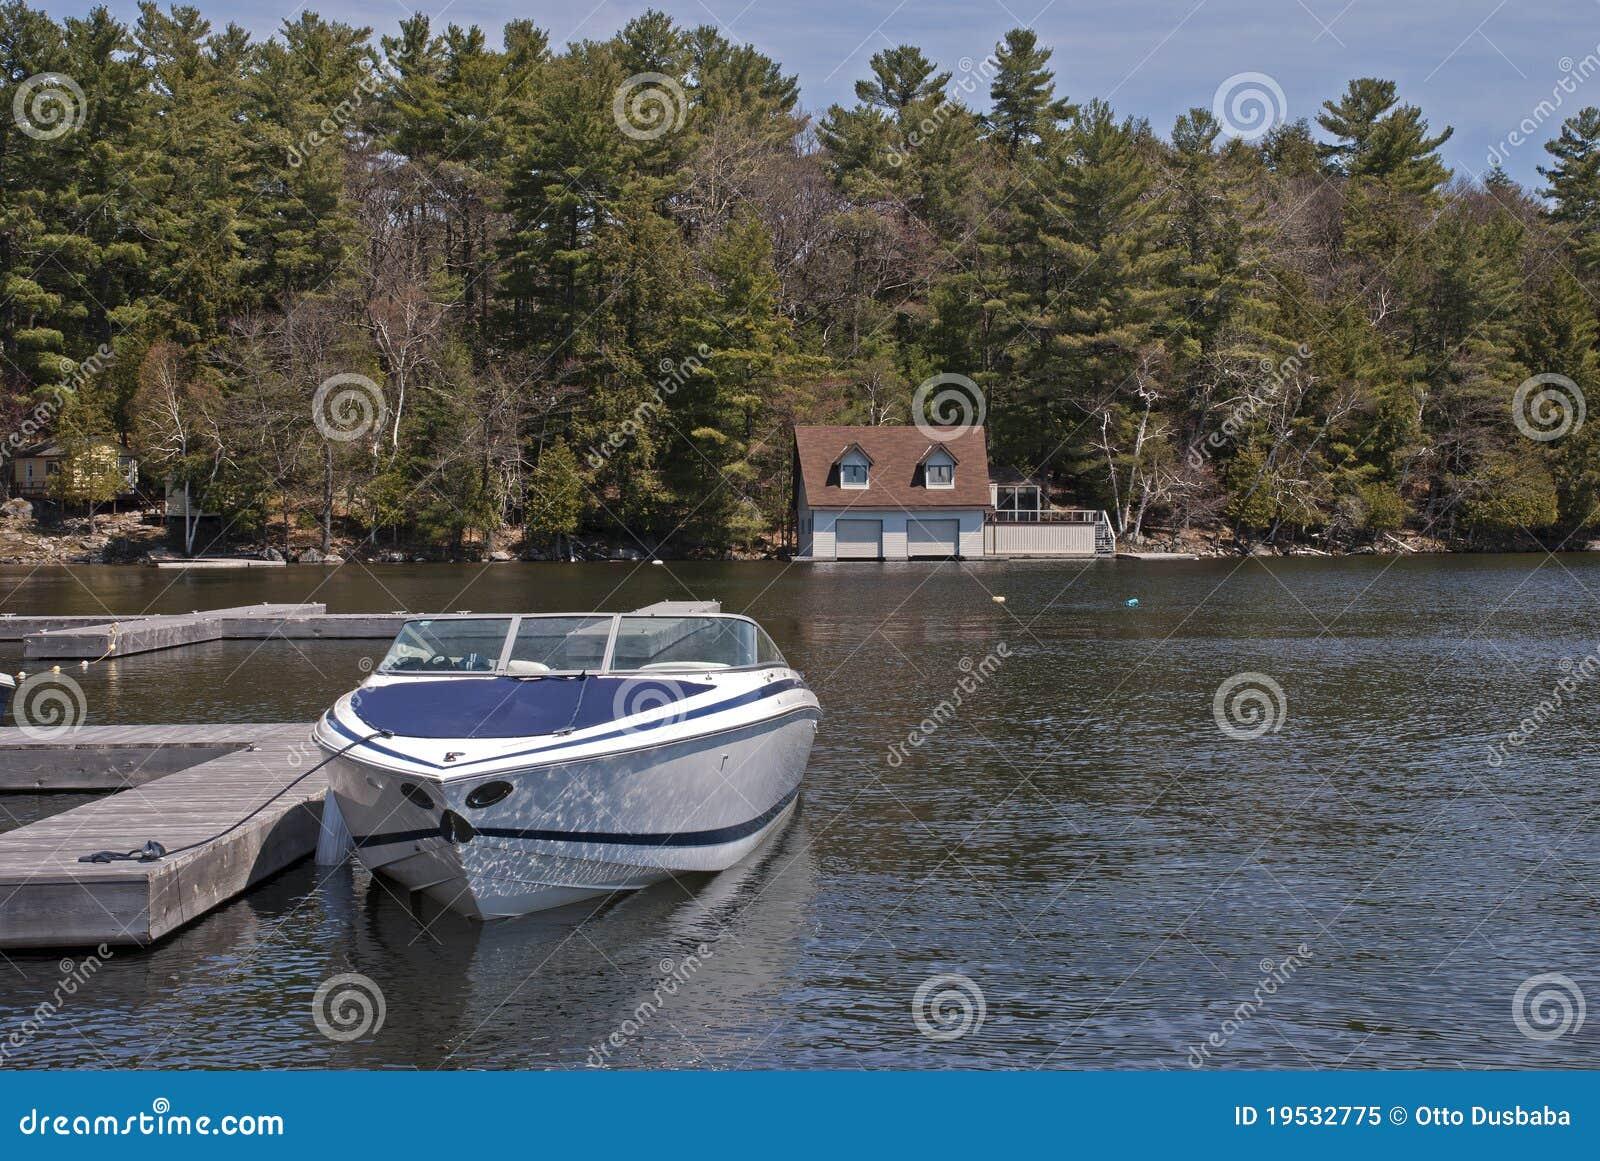 Motorboat docked on a lake